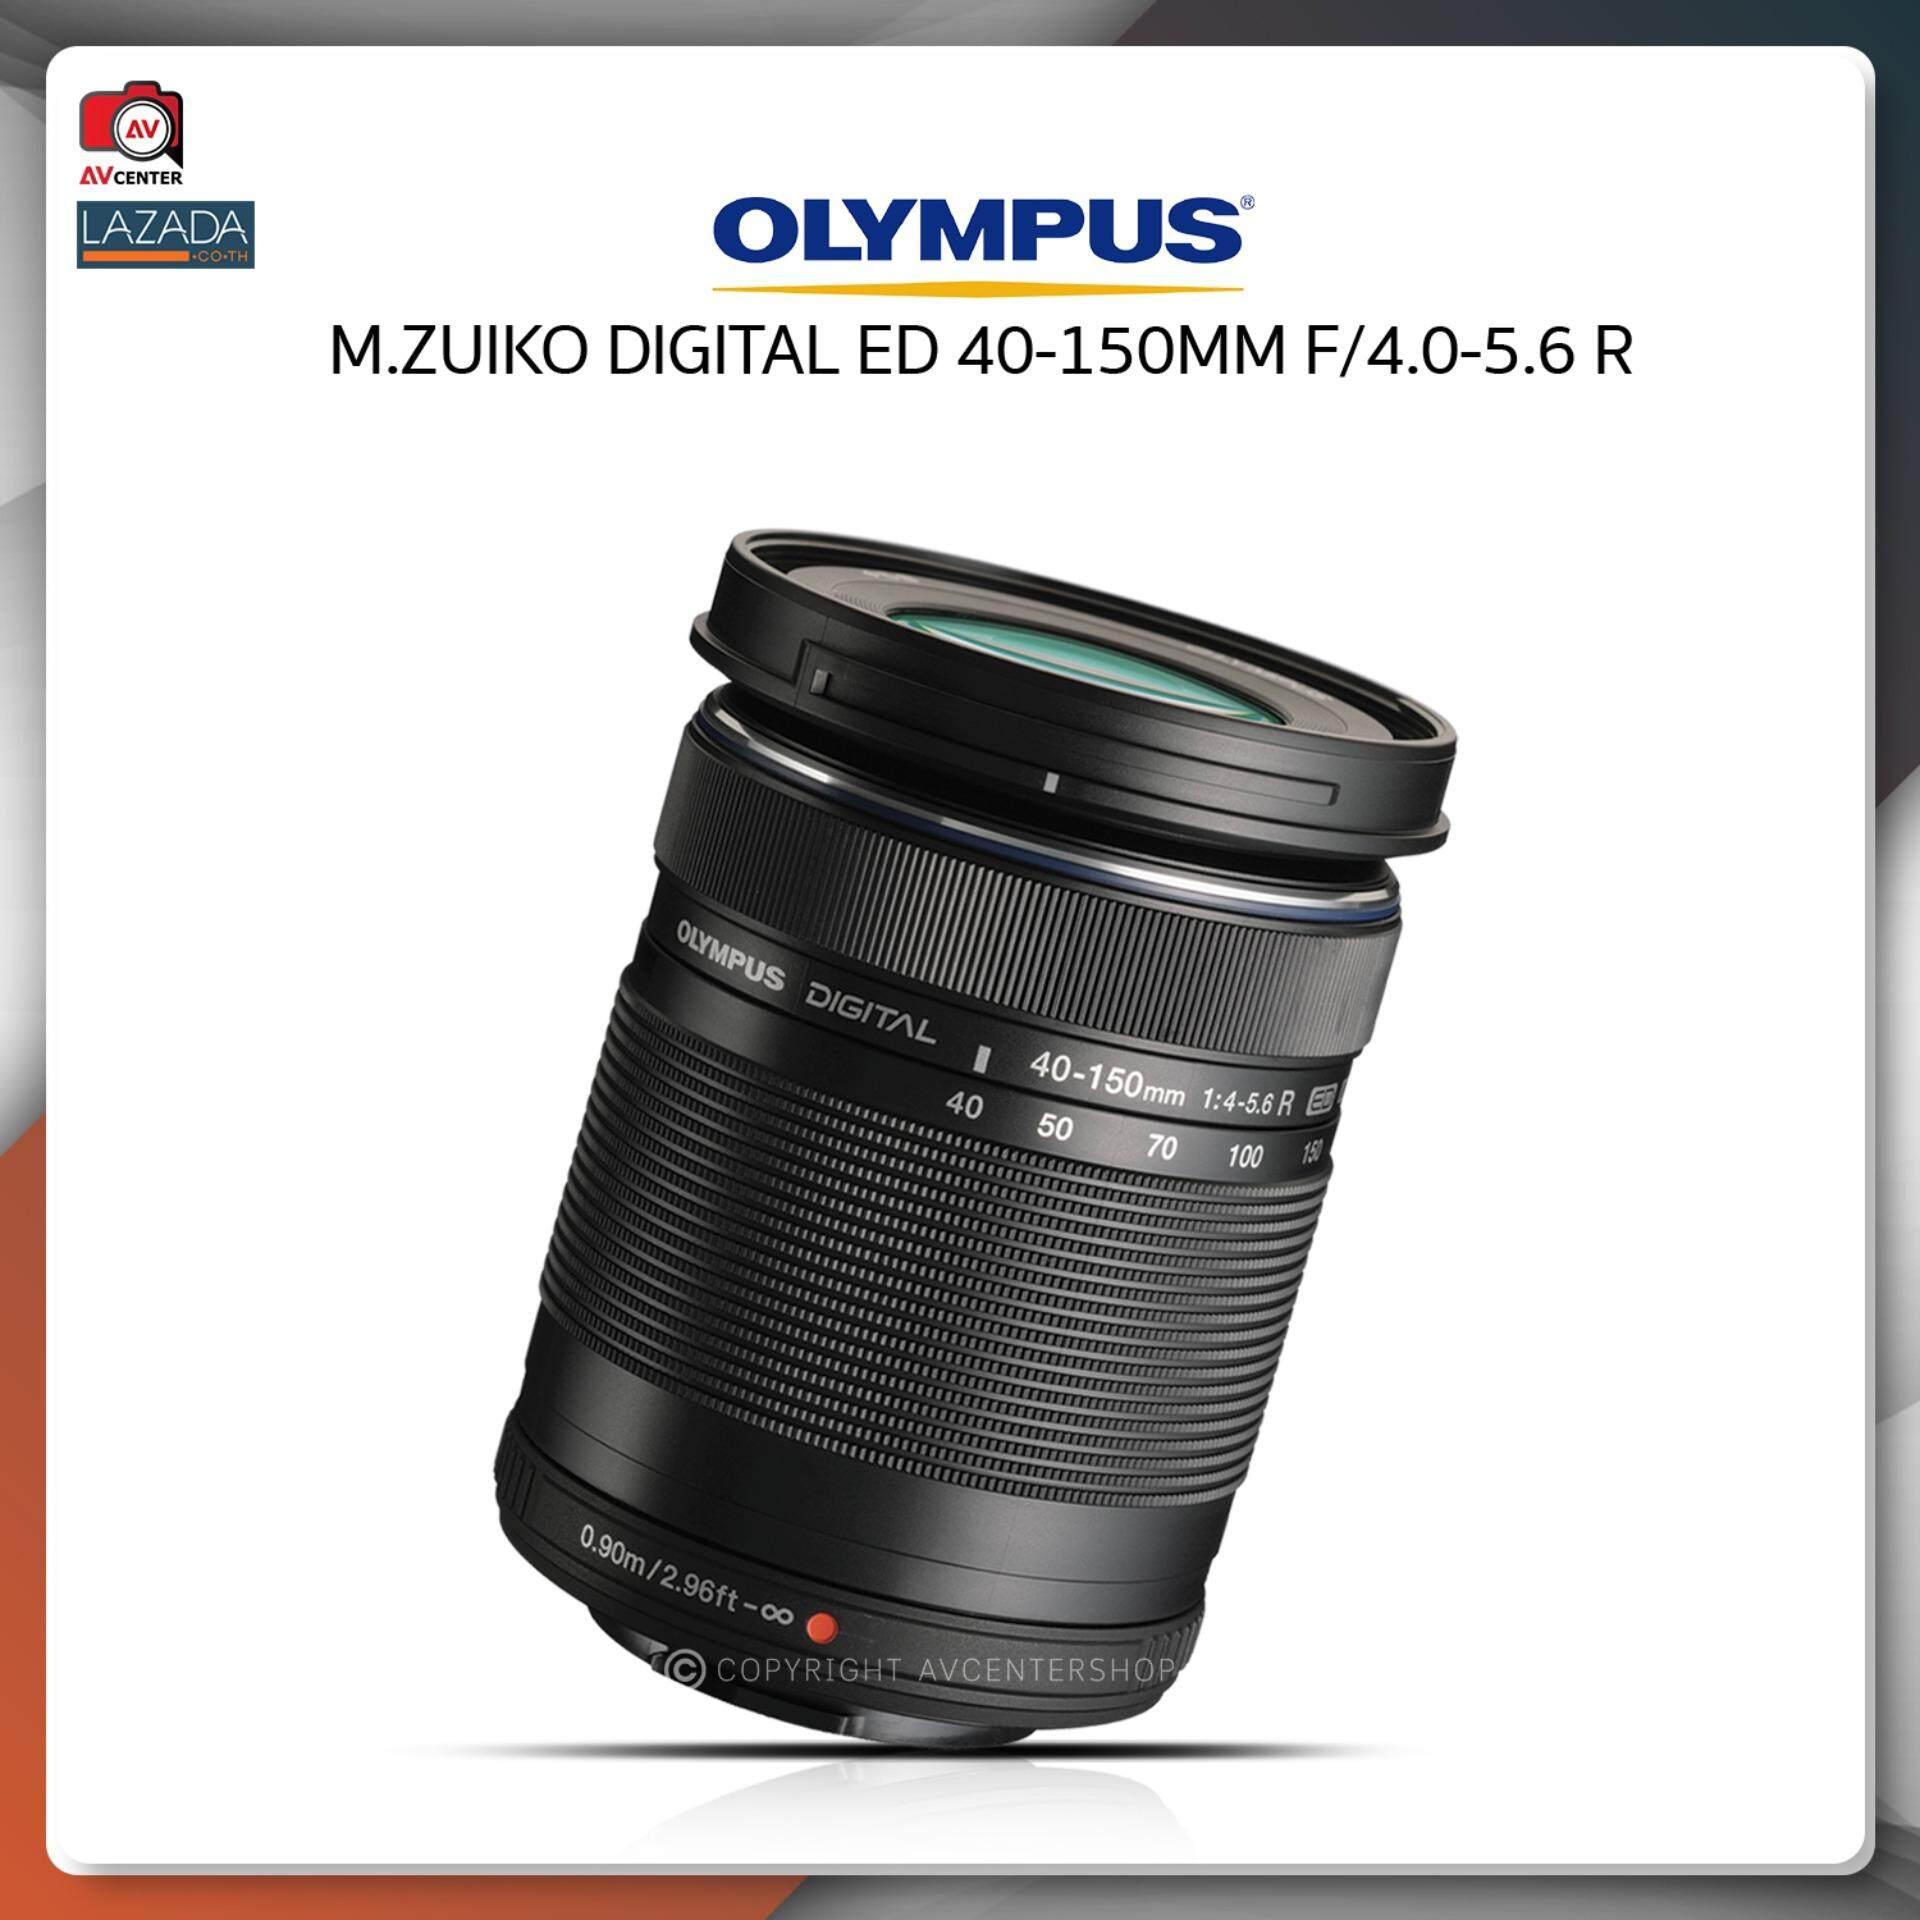 Olympus Mzuiko Digital Ed 12 50mm F35 63 Ez Lens 40 150 Mm F40 56